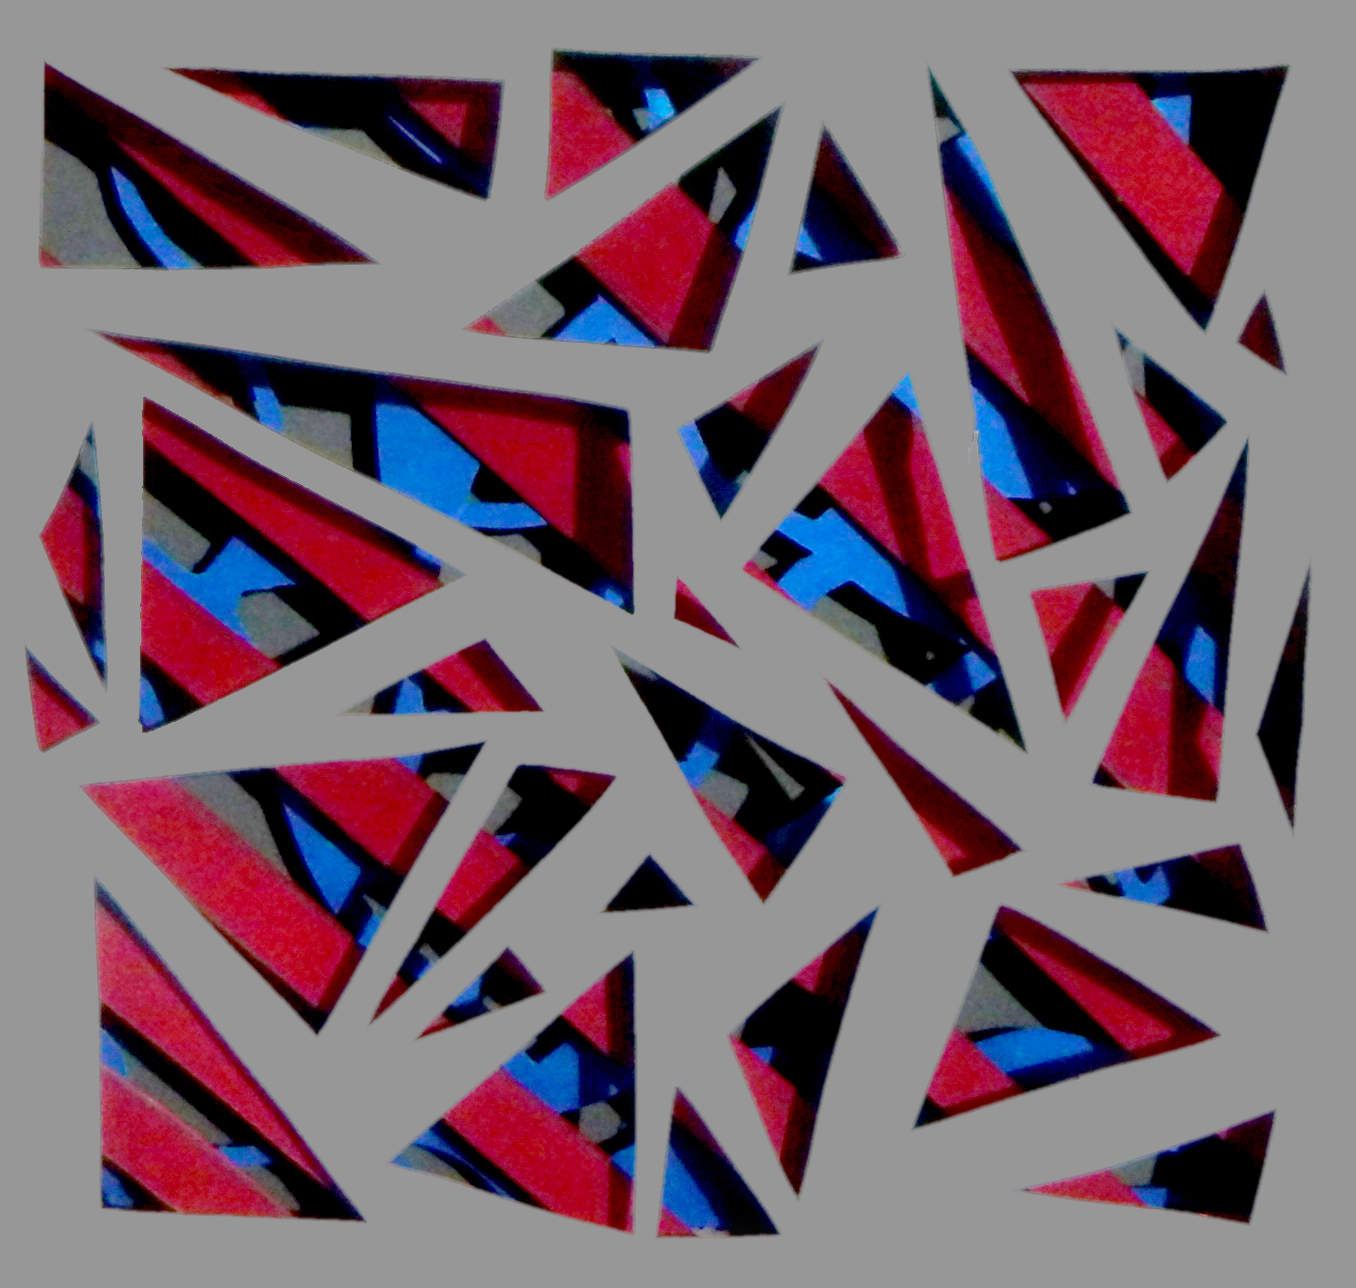 shadowbox_geometric6.jpg